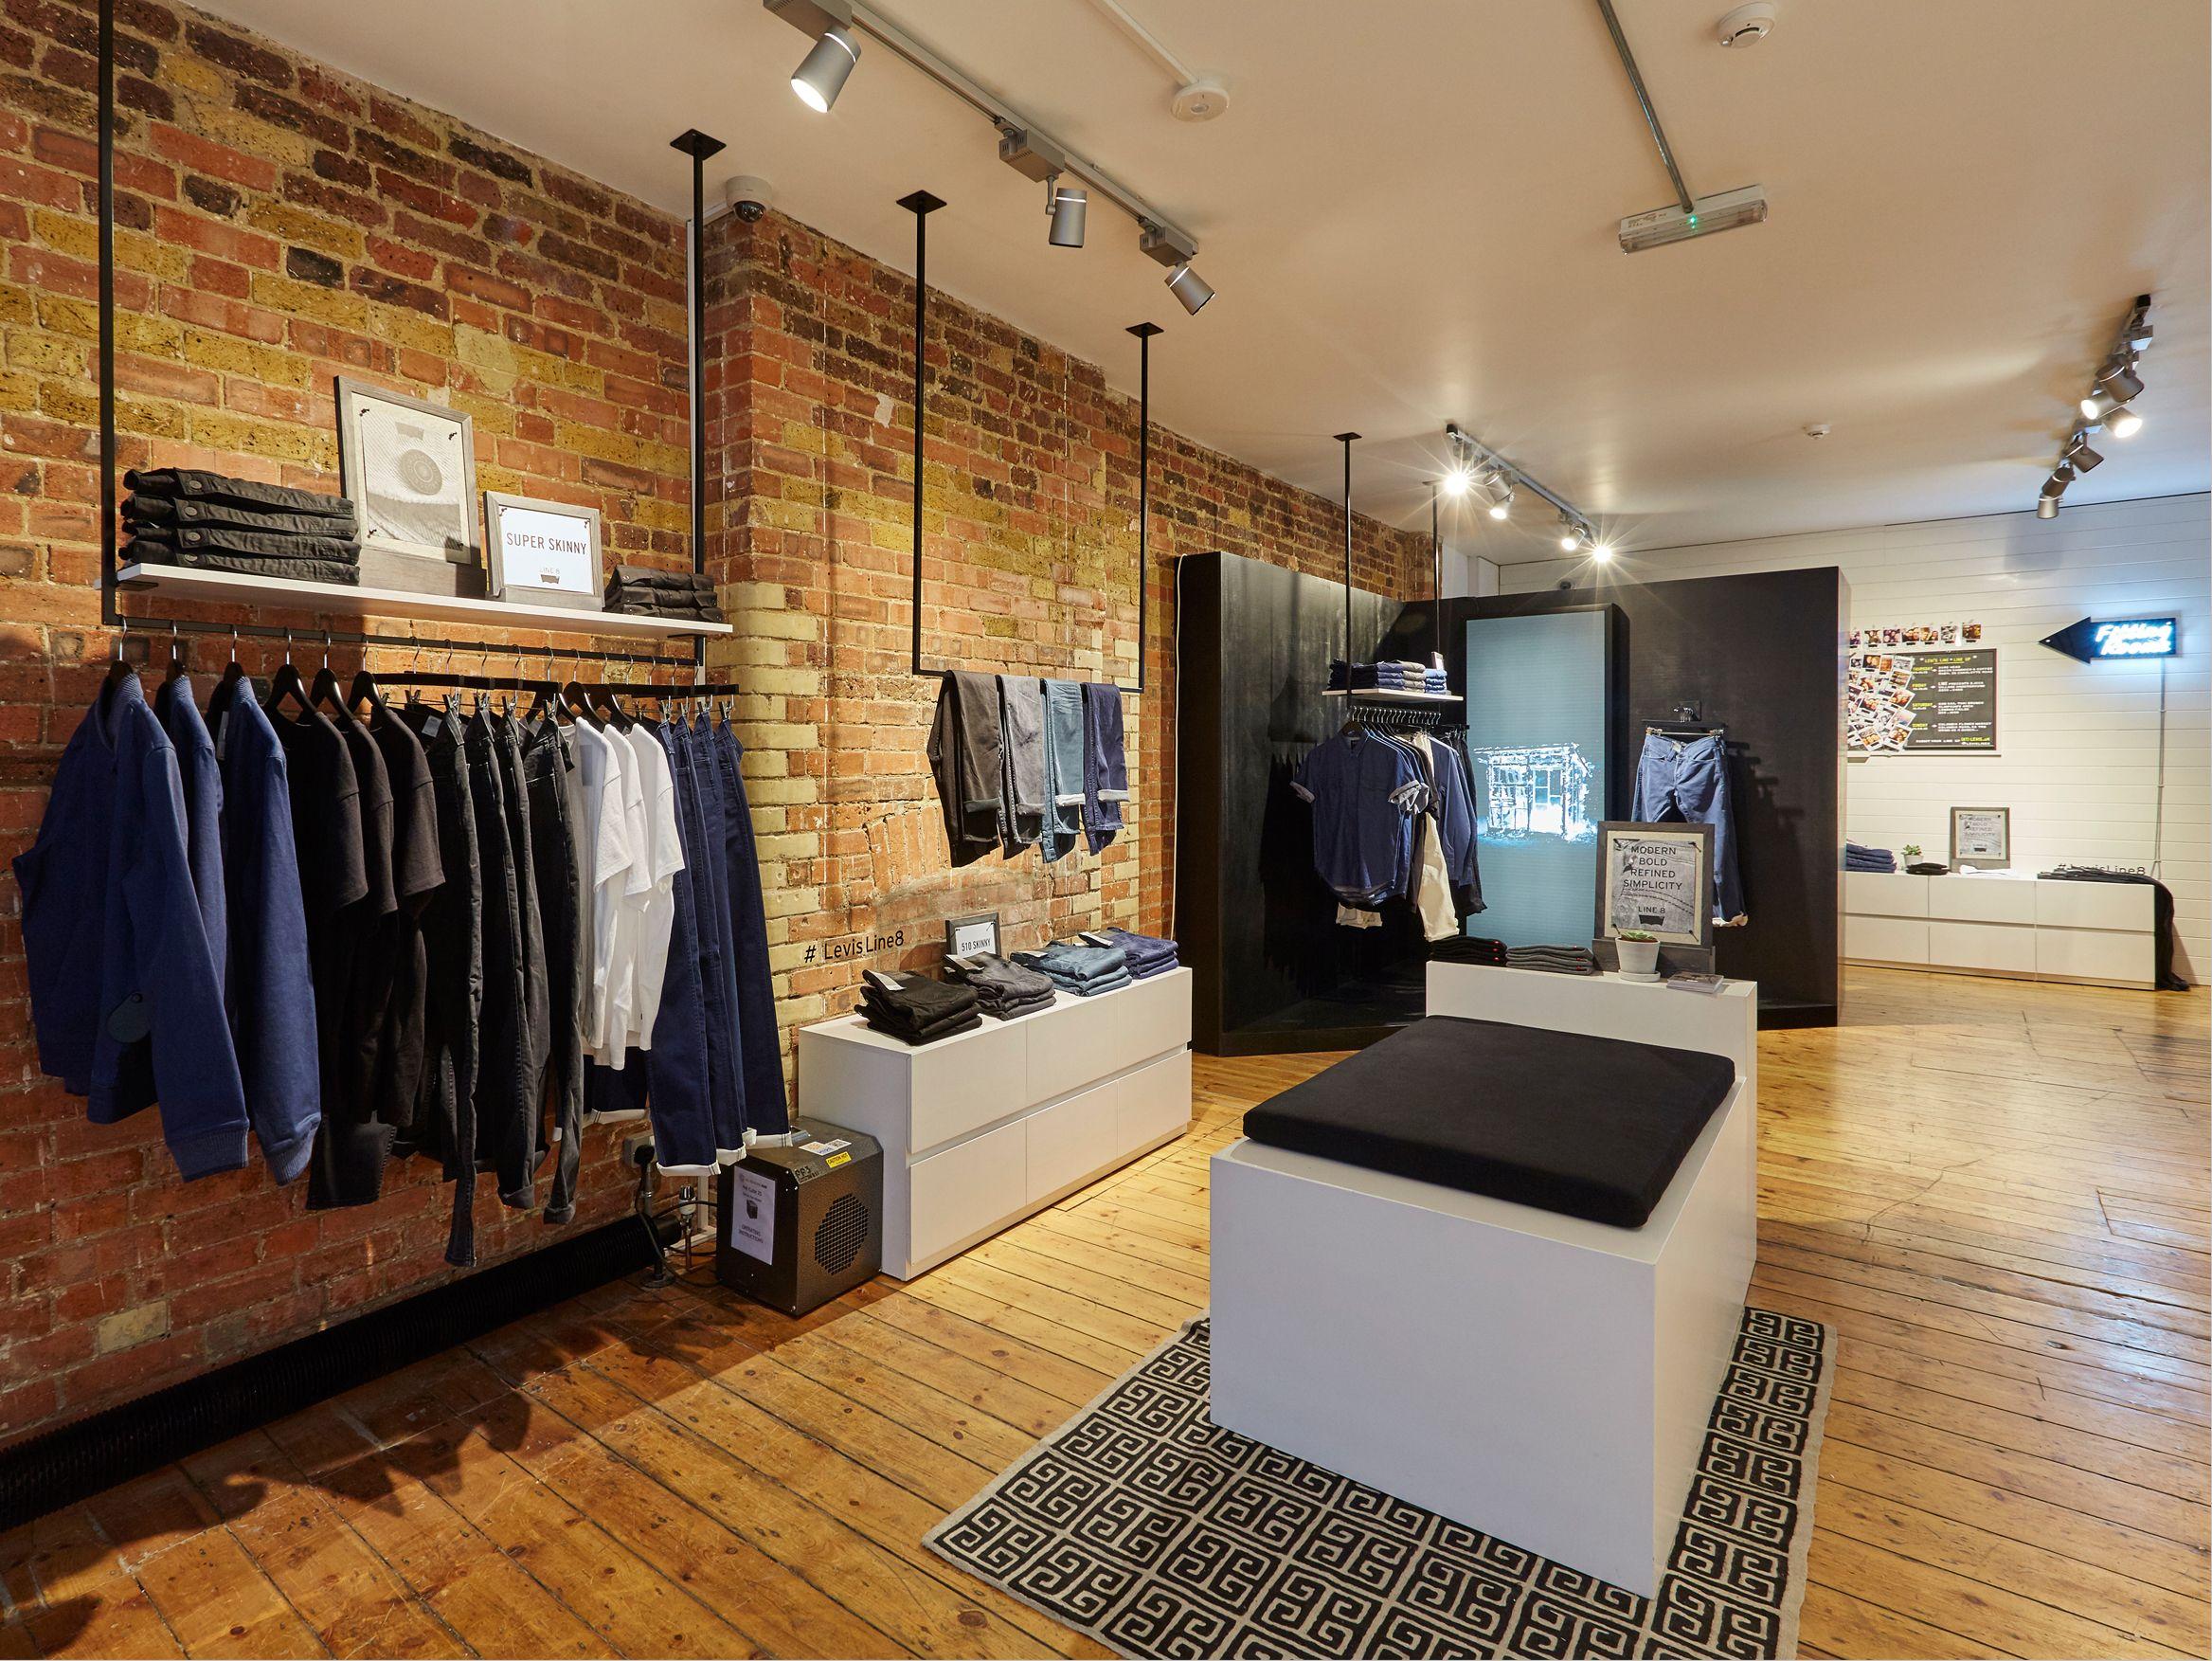 FormRoom for Levi's   Line 8 Pop-Up, Charlotte Road   #Levis #Line8 #PopUp #RetailInteriors #StoreDesign #VM